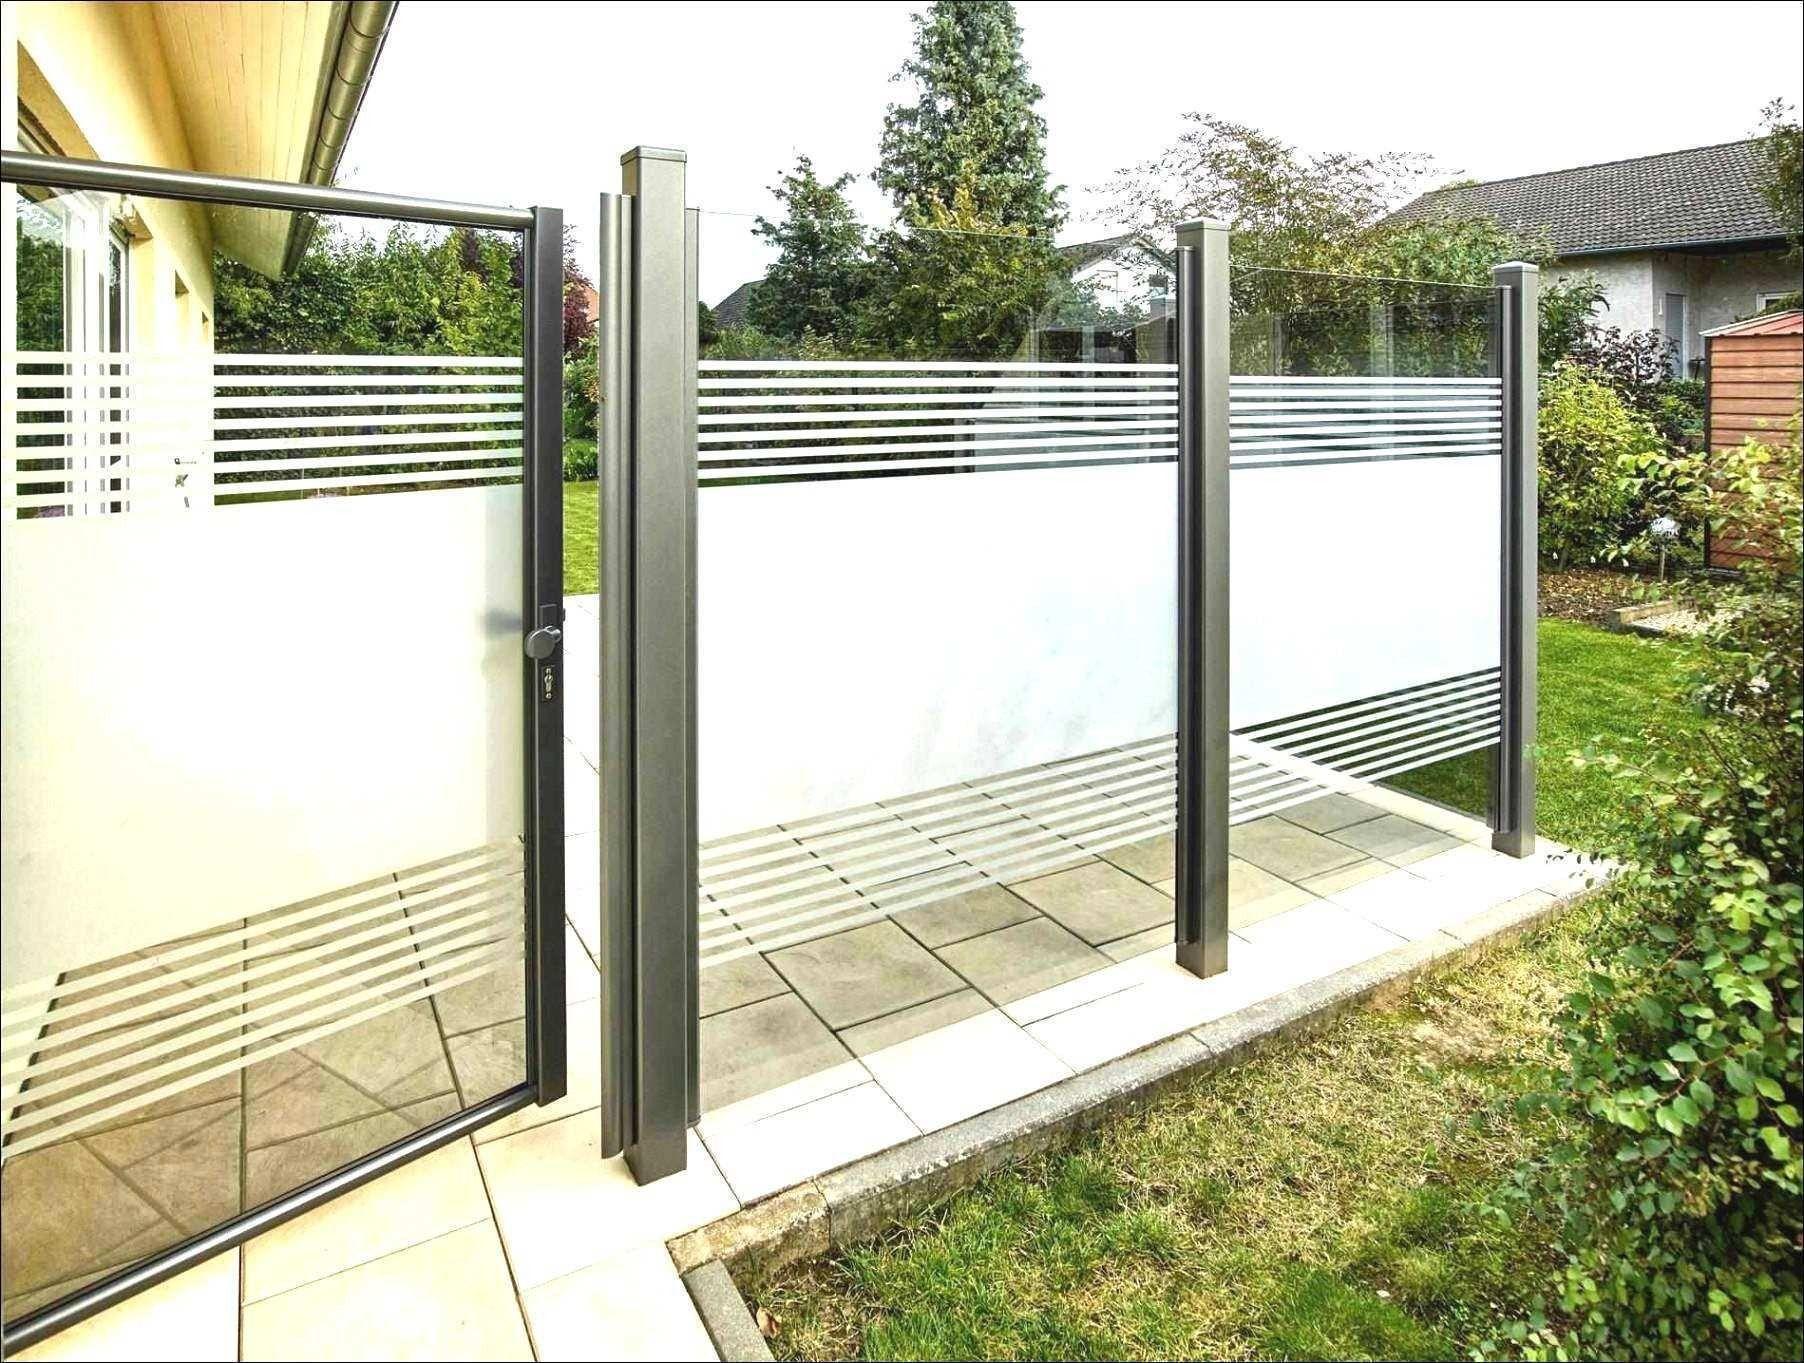 Ideen 44 Zum Garten Terrasse Bauen Check More At Https Www